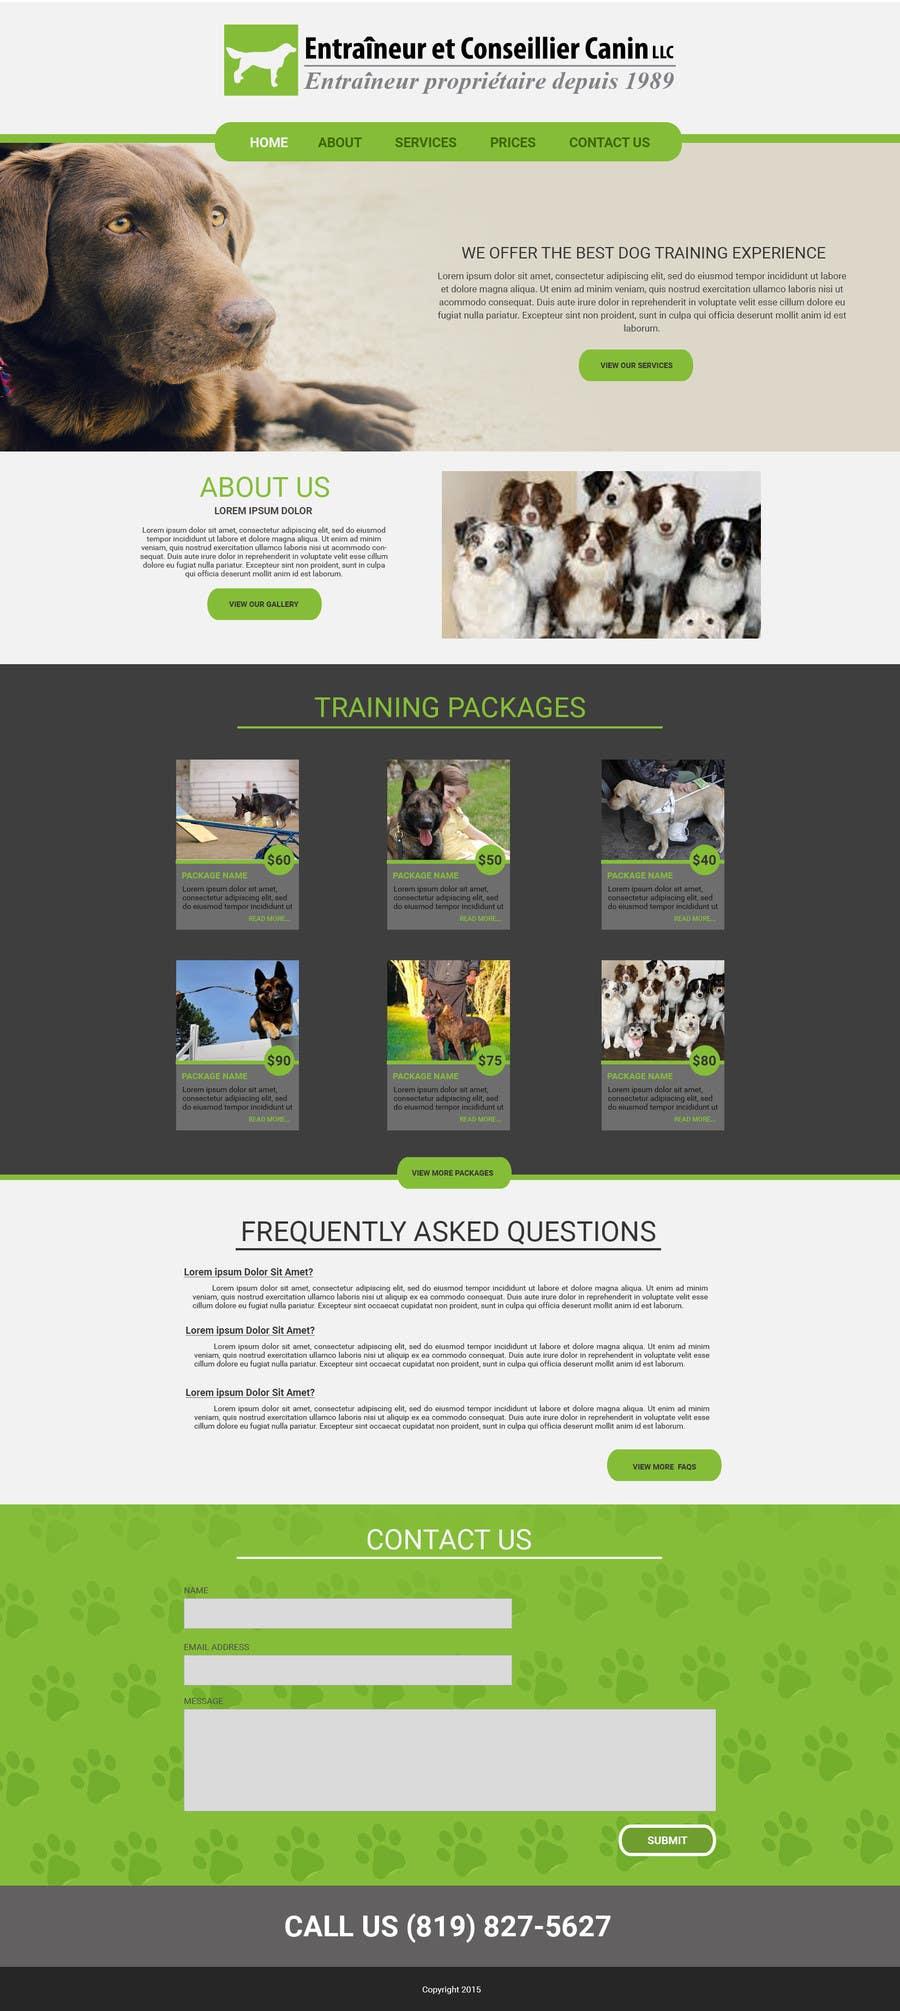 Penyertaan Peraduan #18 untuk Urgent design for Dog trainer website